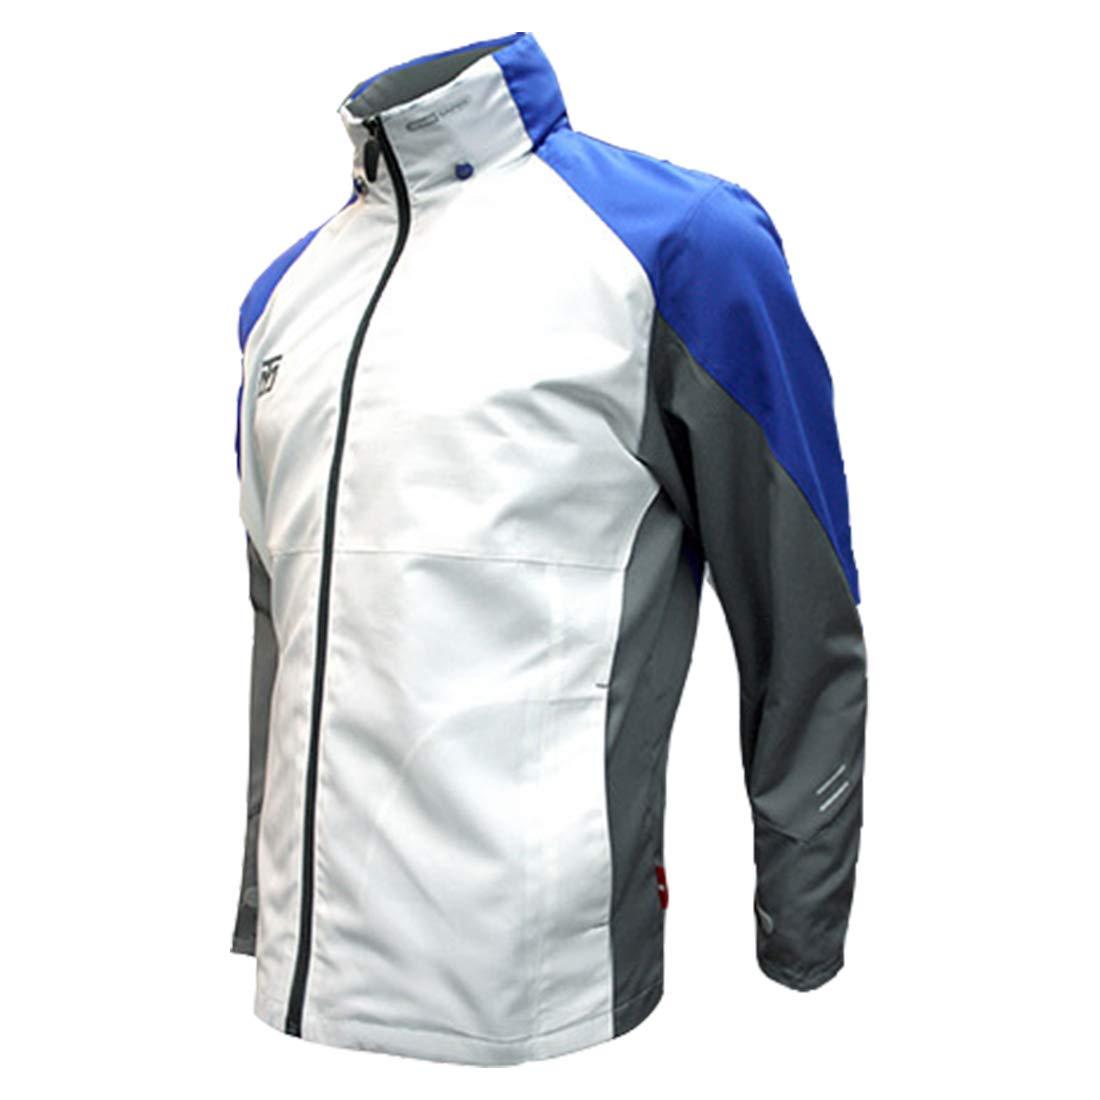 MOOTO Taekwondo Wing Jacket Martial arts Team Uniform ウイングジャケットウインドブレーカートラックスーツトレーニングテコンドーチームユニフォームジム ホワイト+ブルー(白い+青) 210(200-210cm)(6.56-6.89ft)